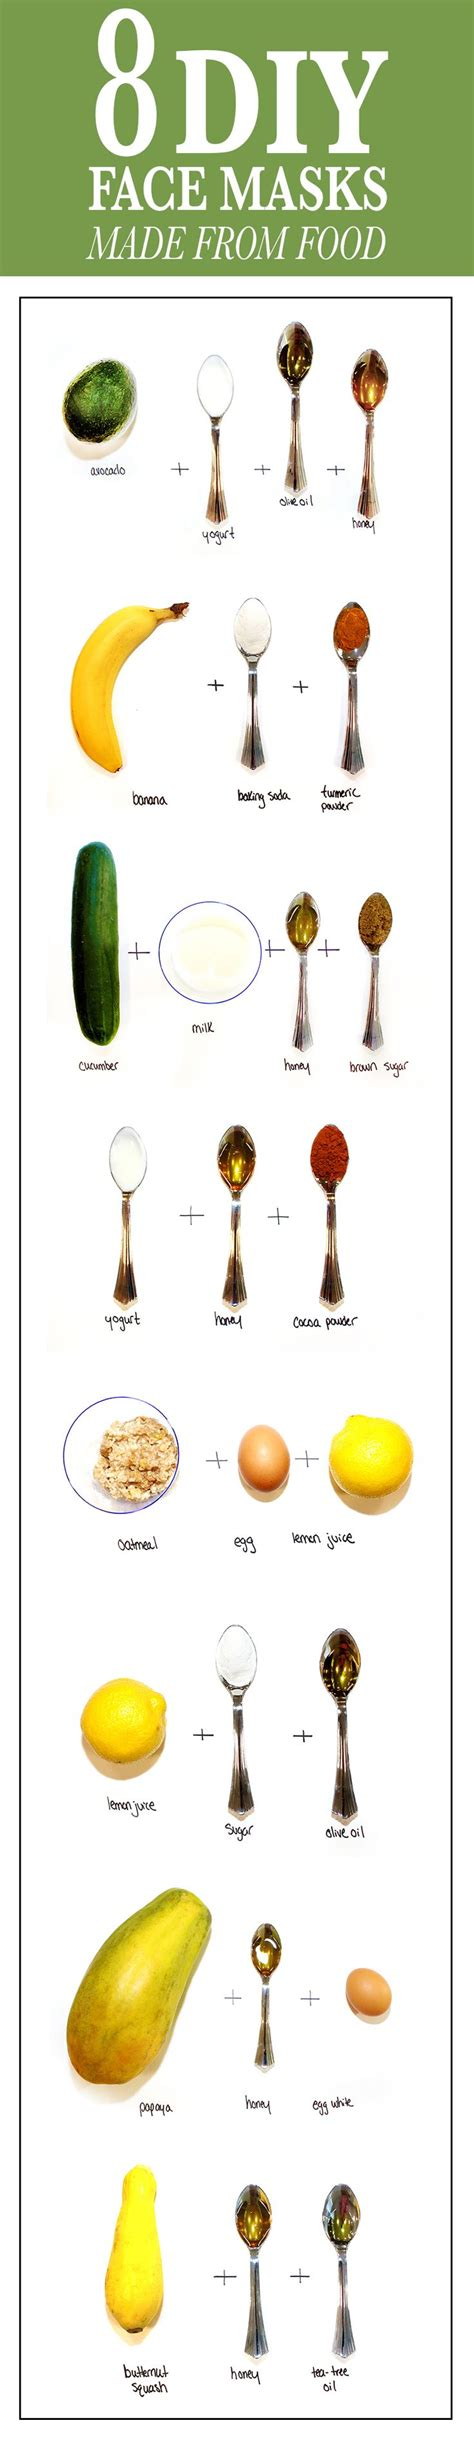 masking cuisine the 25 best skin care ideas on clear skin